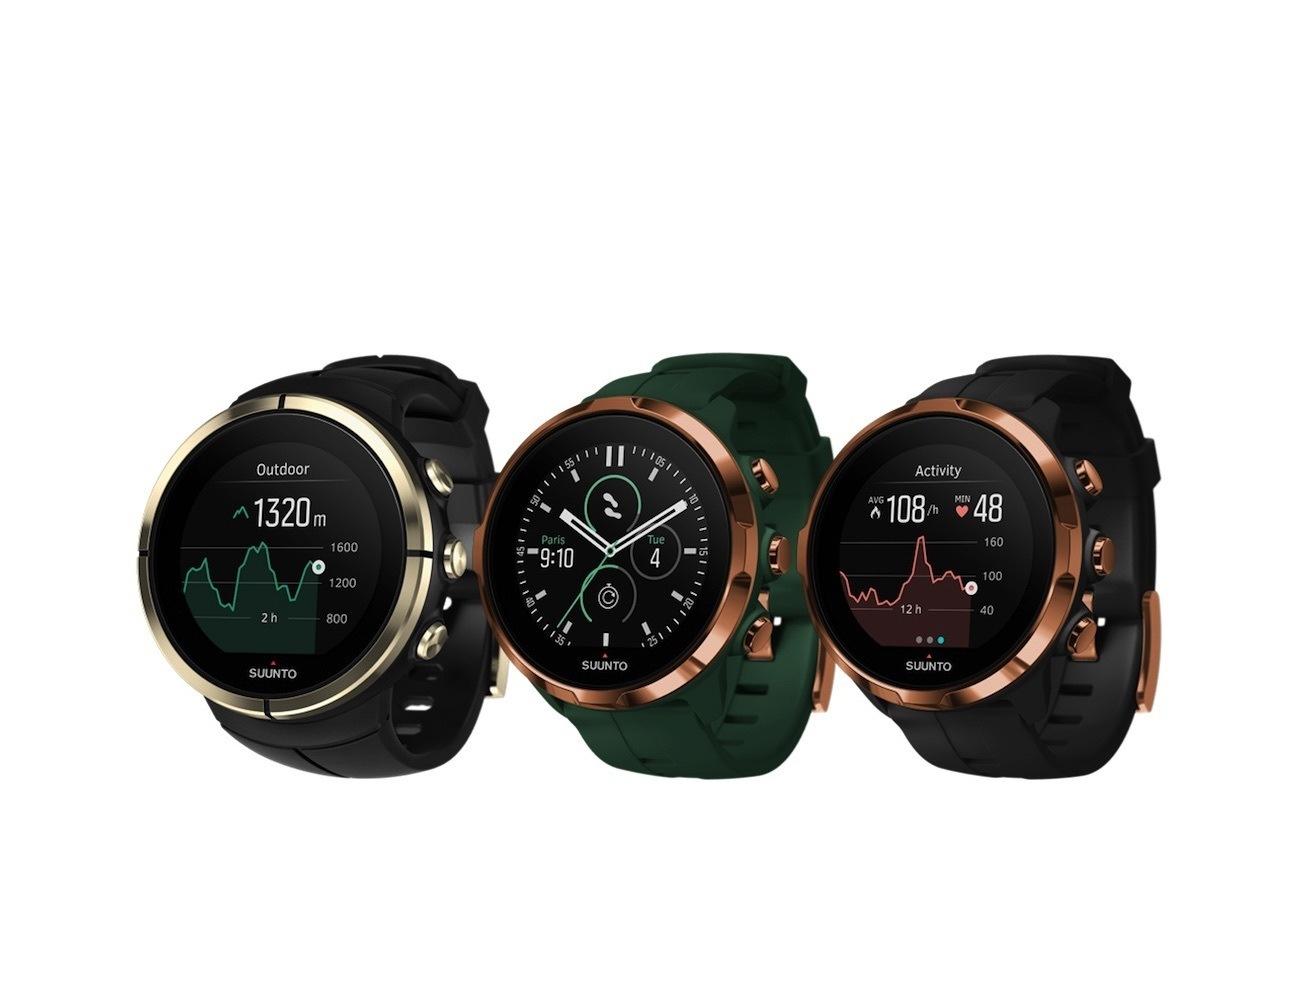 Suunto Spartan Athlete Smartwatches 187 Gadget Flow